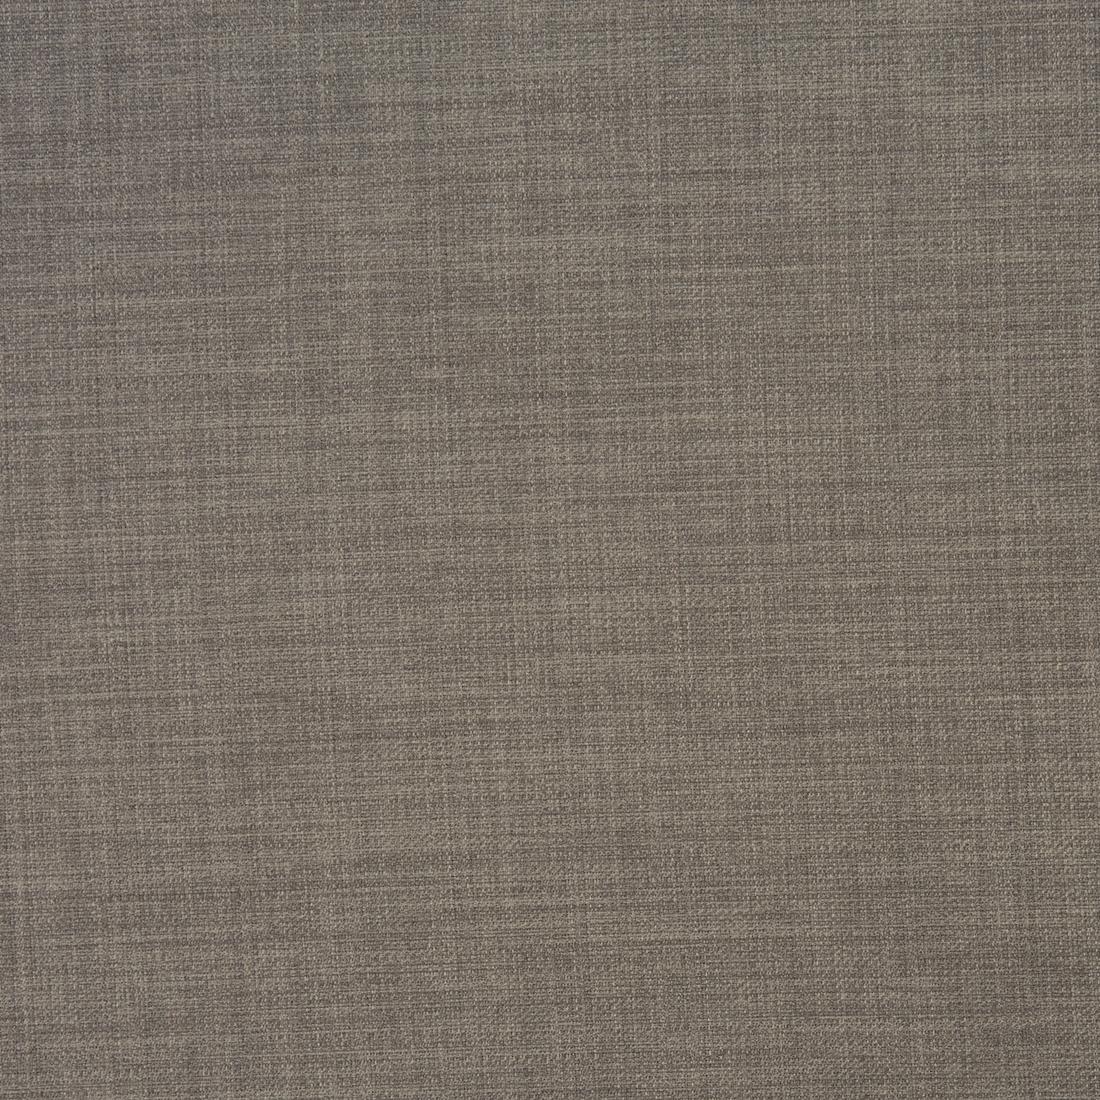 Linoso Grey Upholstery Fabric